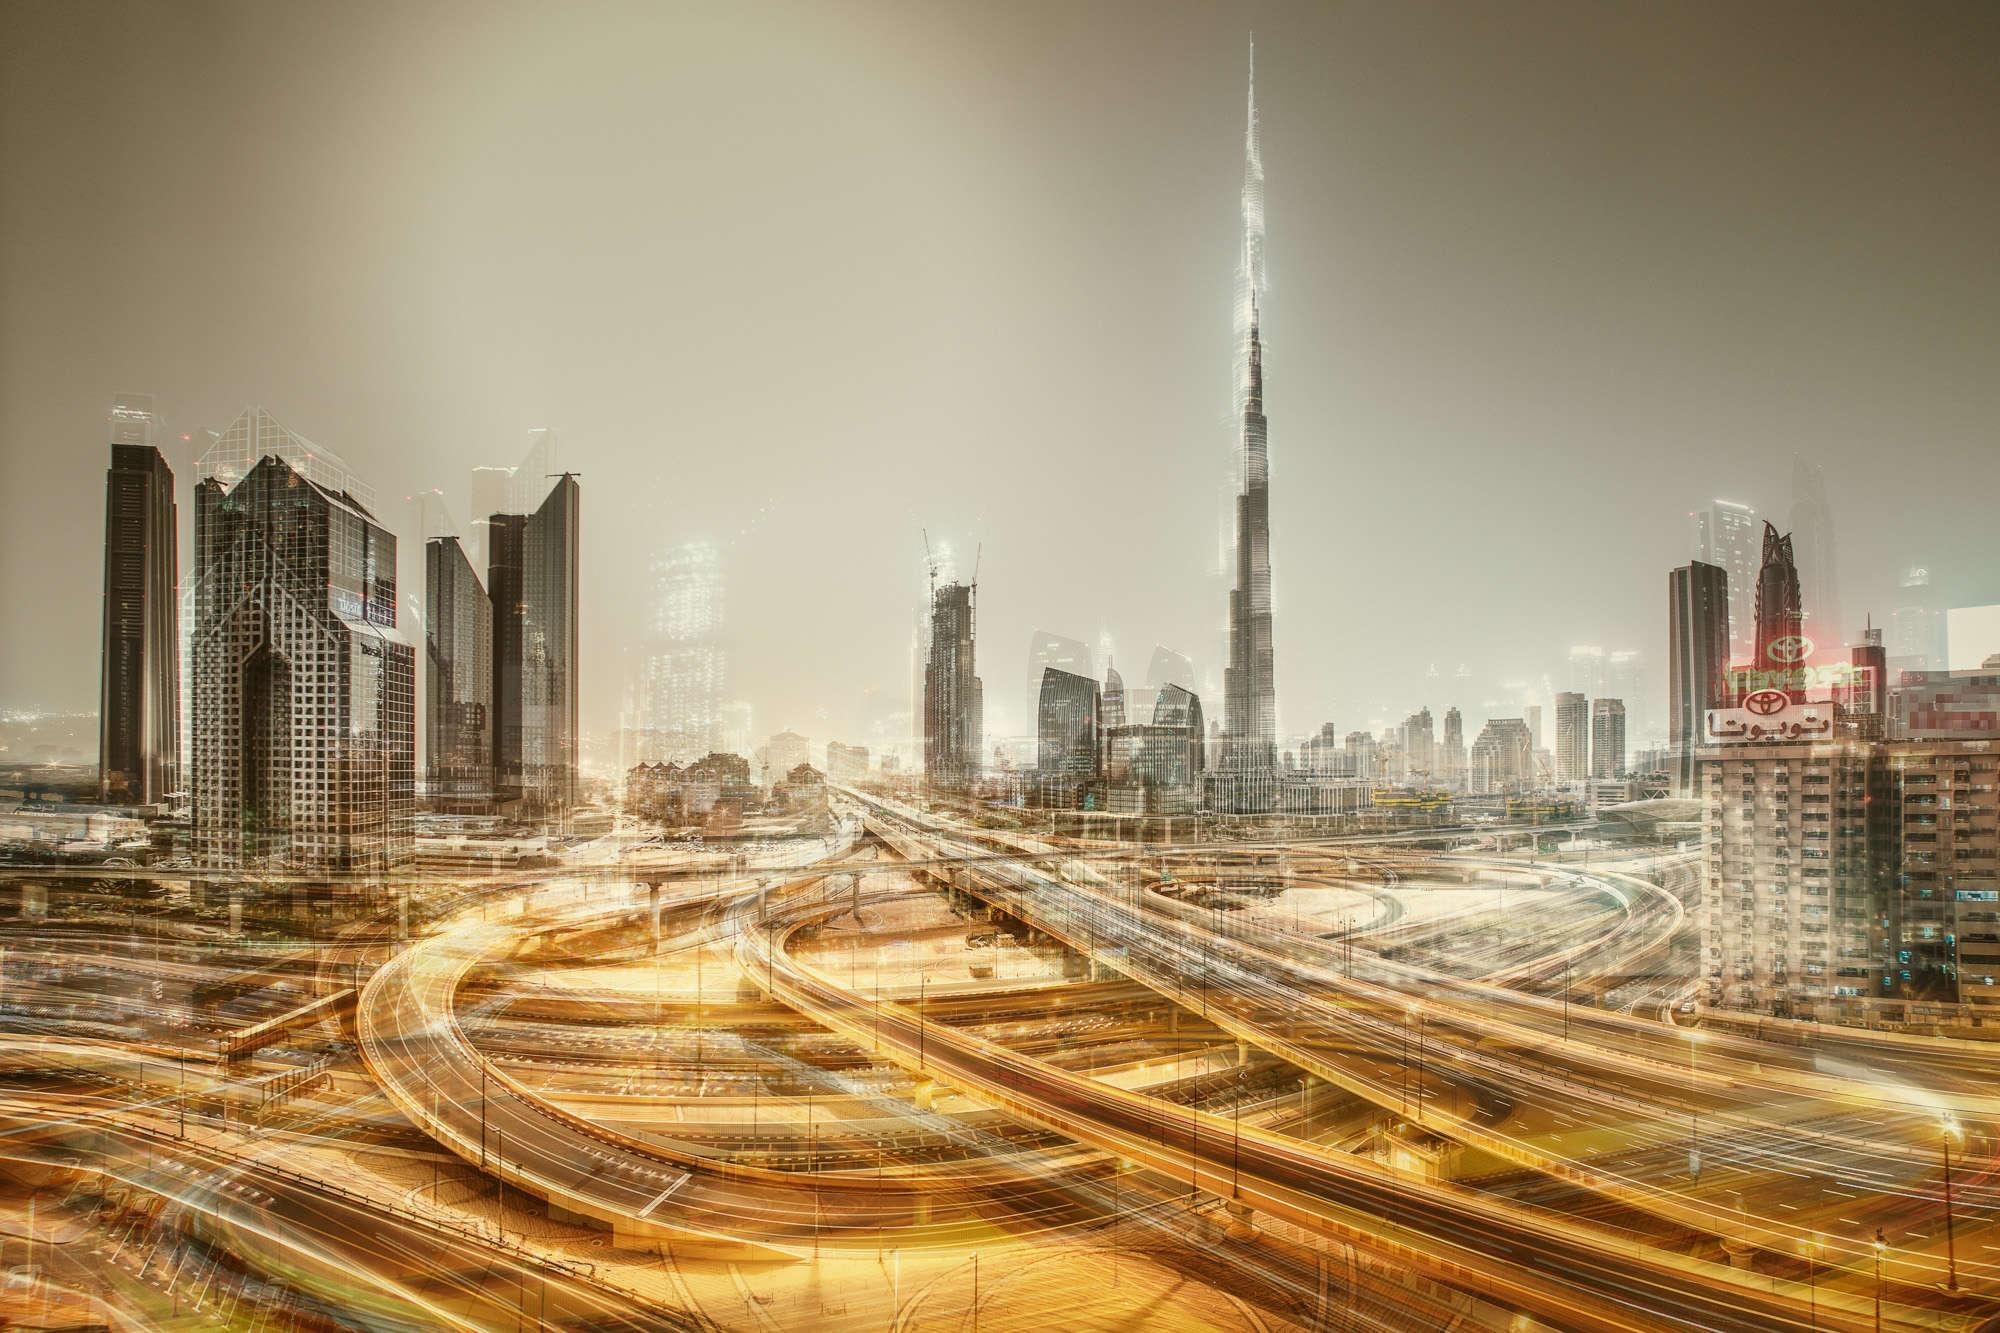 Laurent Dequick - Dubai Sheikh Zayed Road